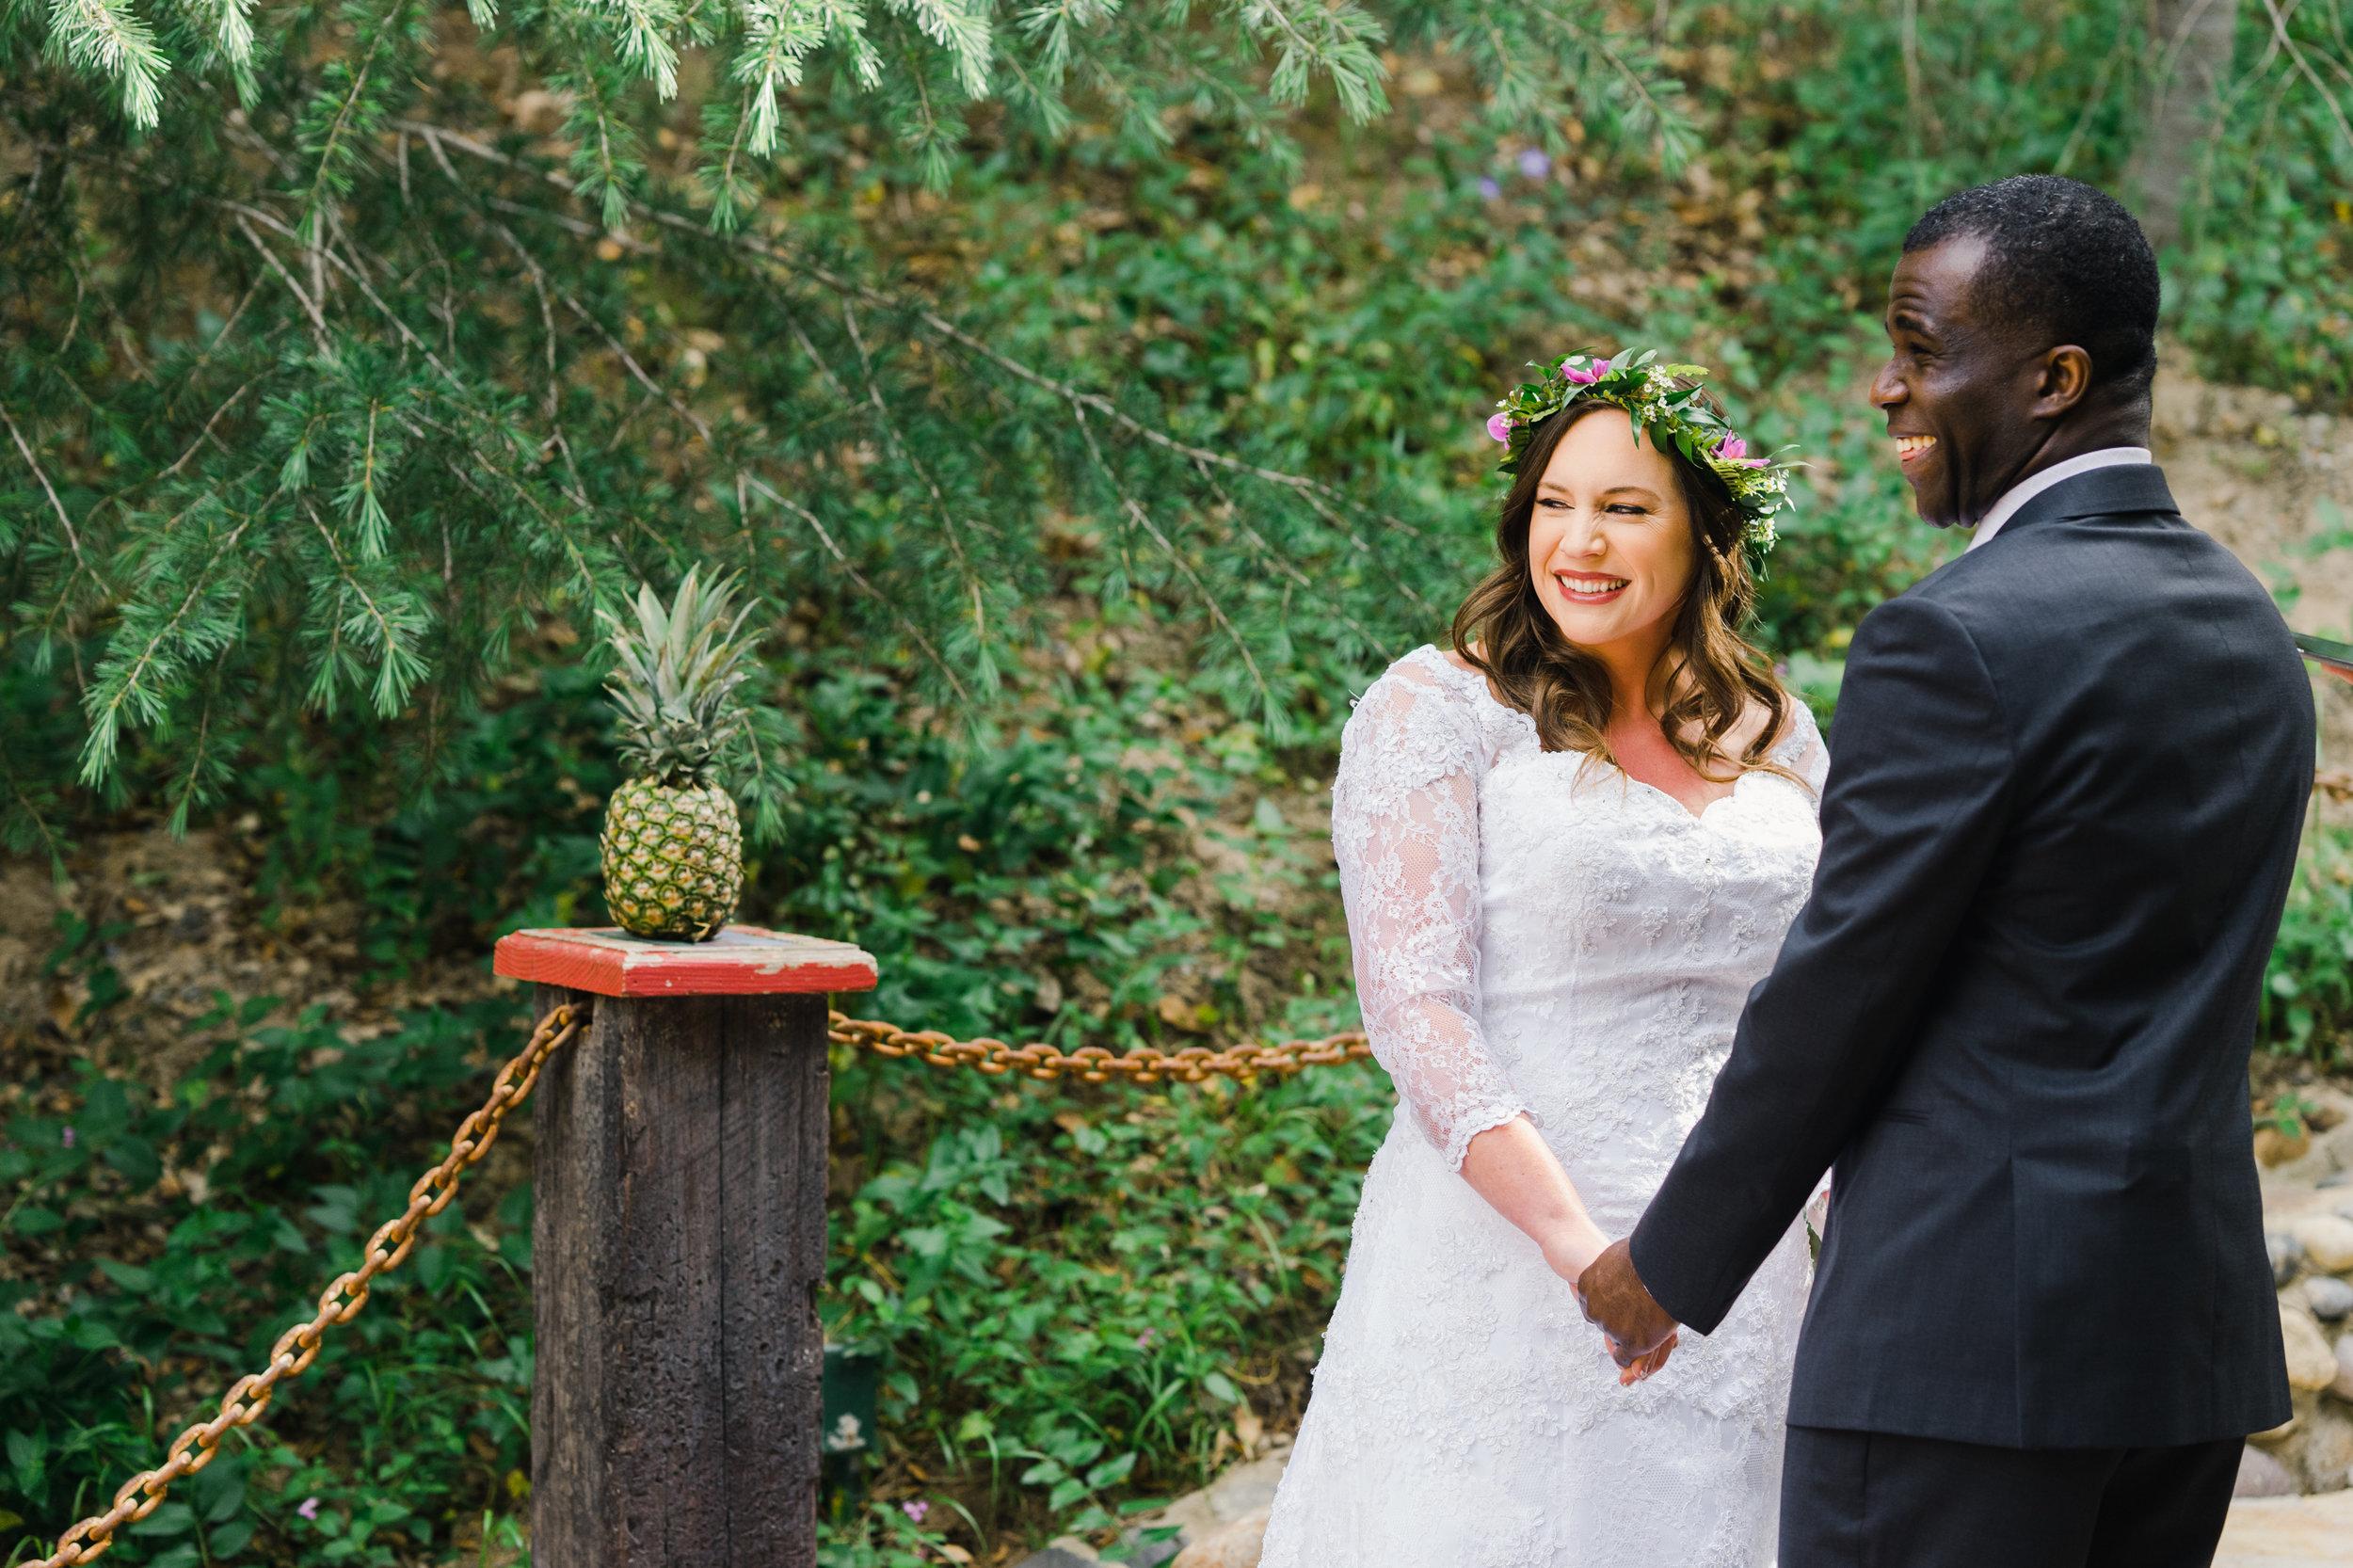 rancho-las-lomas-wedding-kelsey-sim_0121.JPG